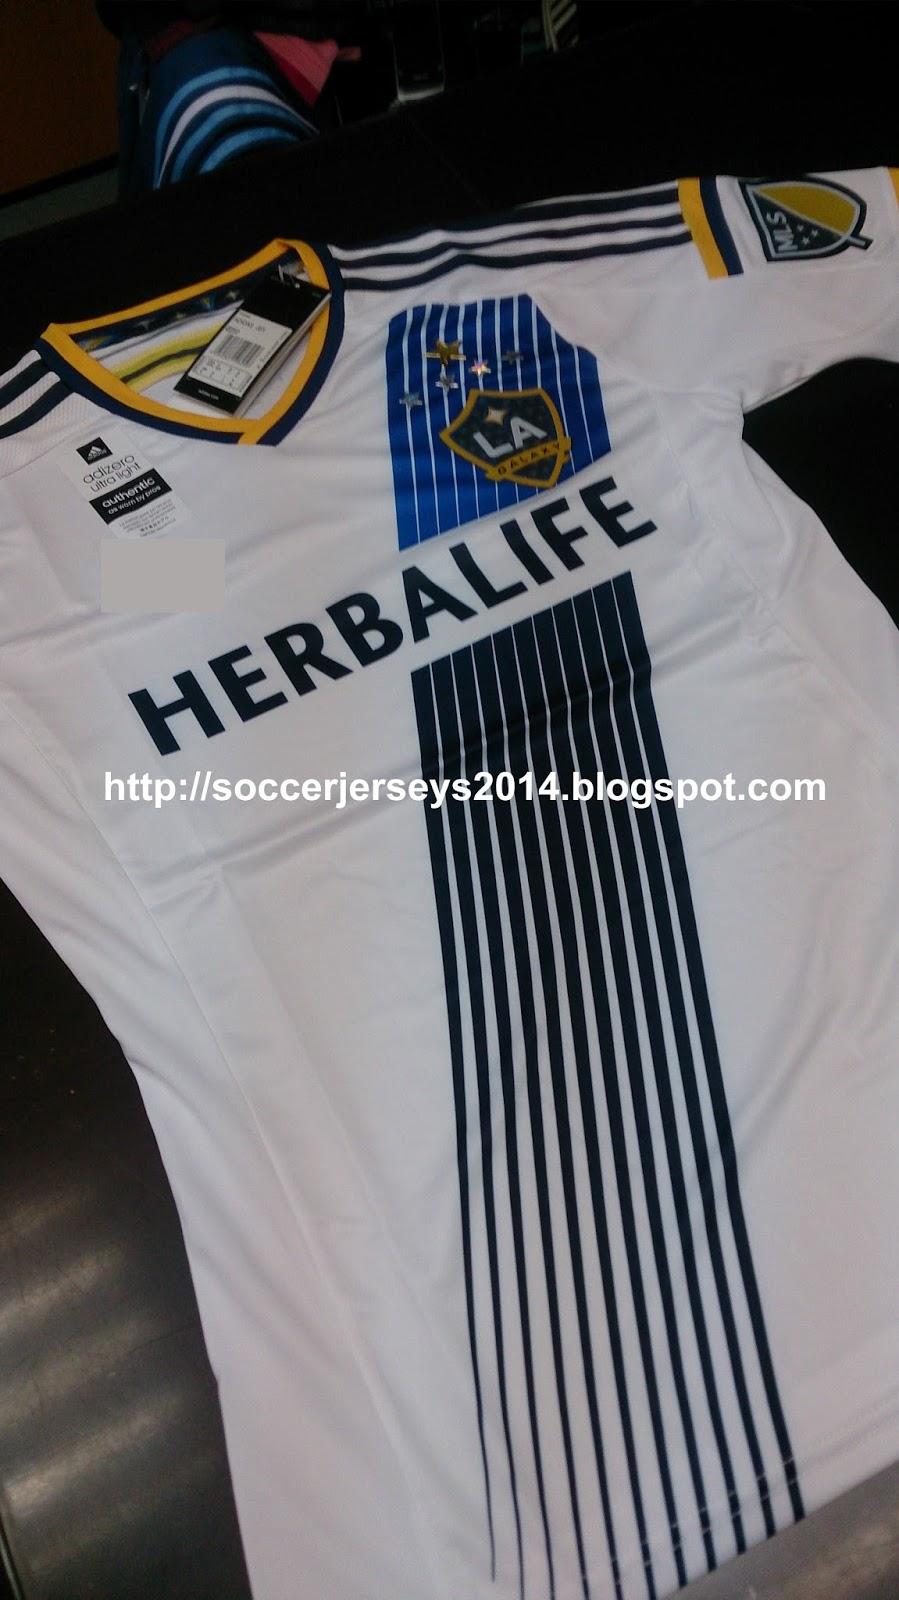 hot sale online 27ecb 5c552 Soccer Jerseys 2014: LA Galaxy Home -2015 - 2016 (Player Issue)